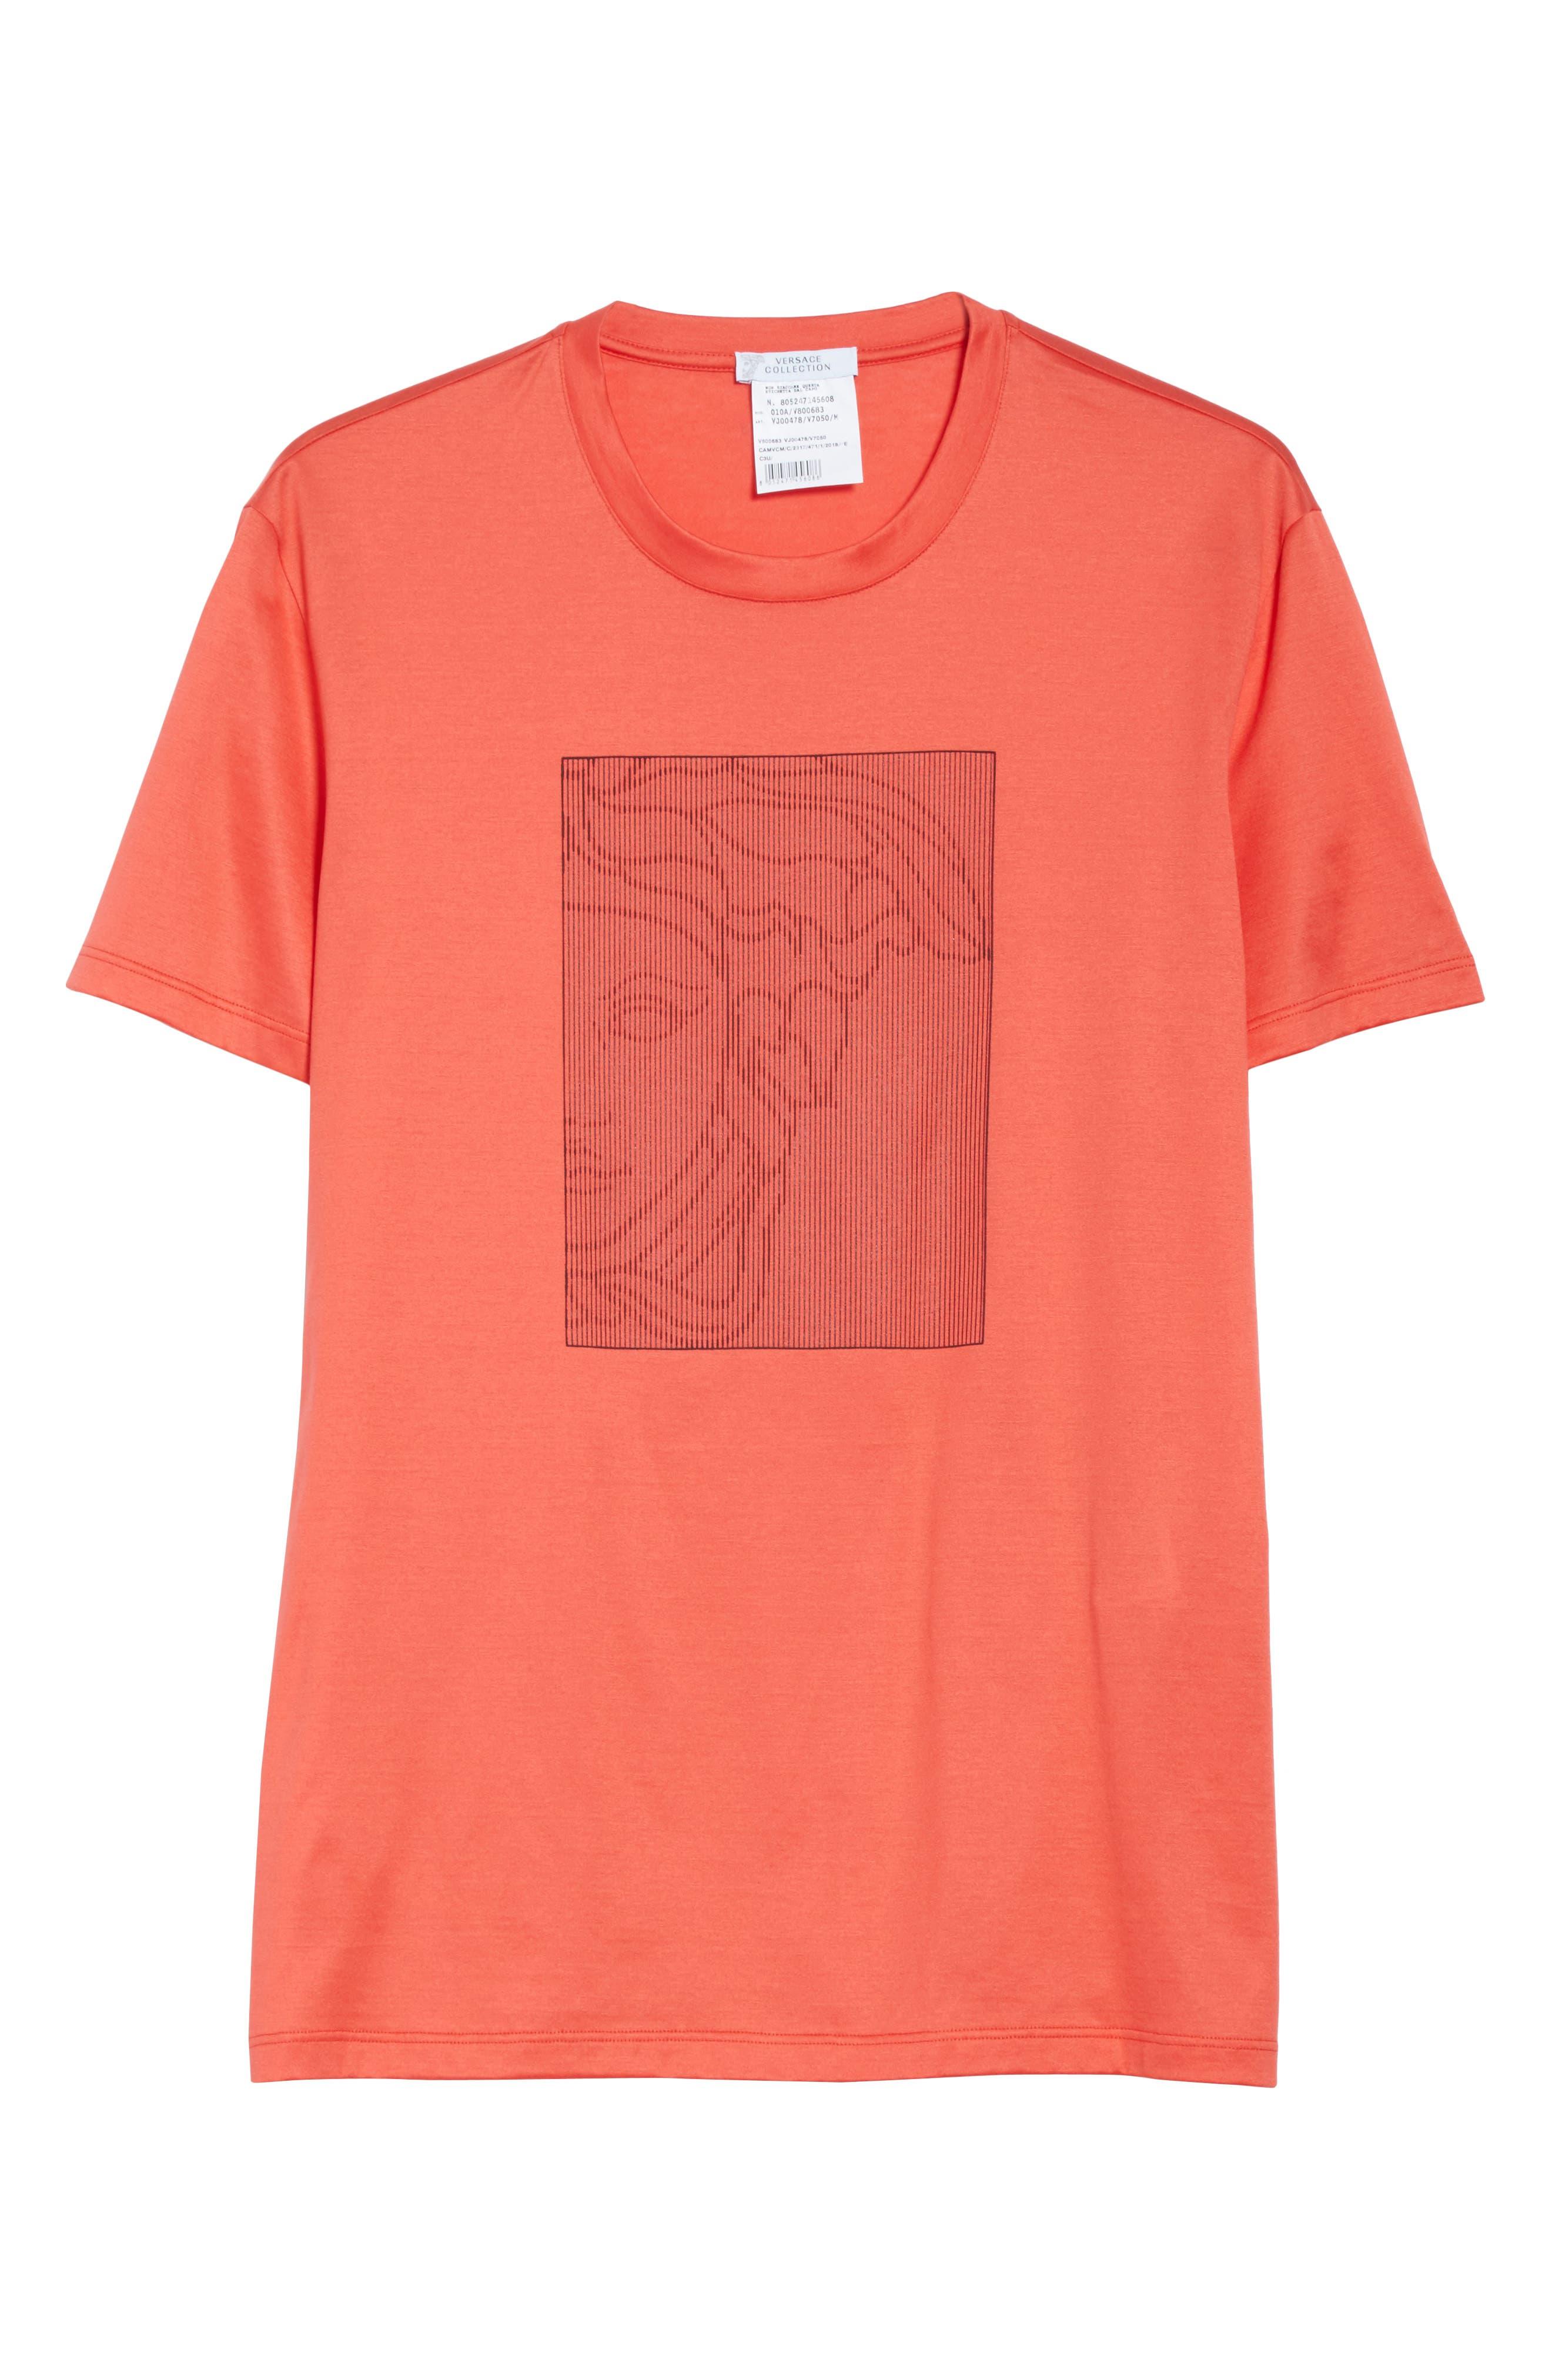 Barcode Medusa Graphic T-Shirt,                             Alternate thumbnail 6, color,                             600